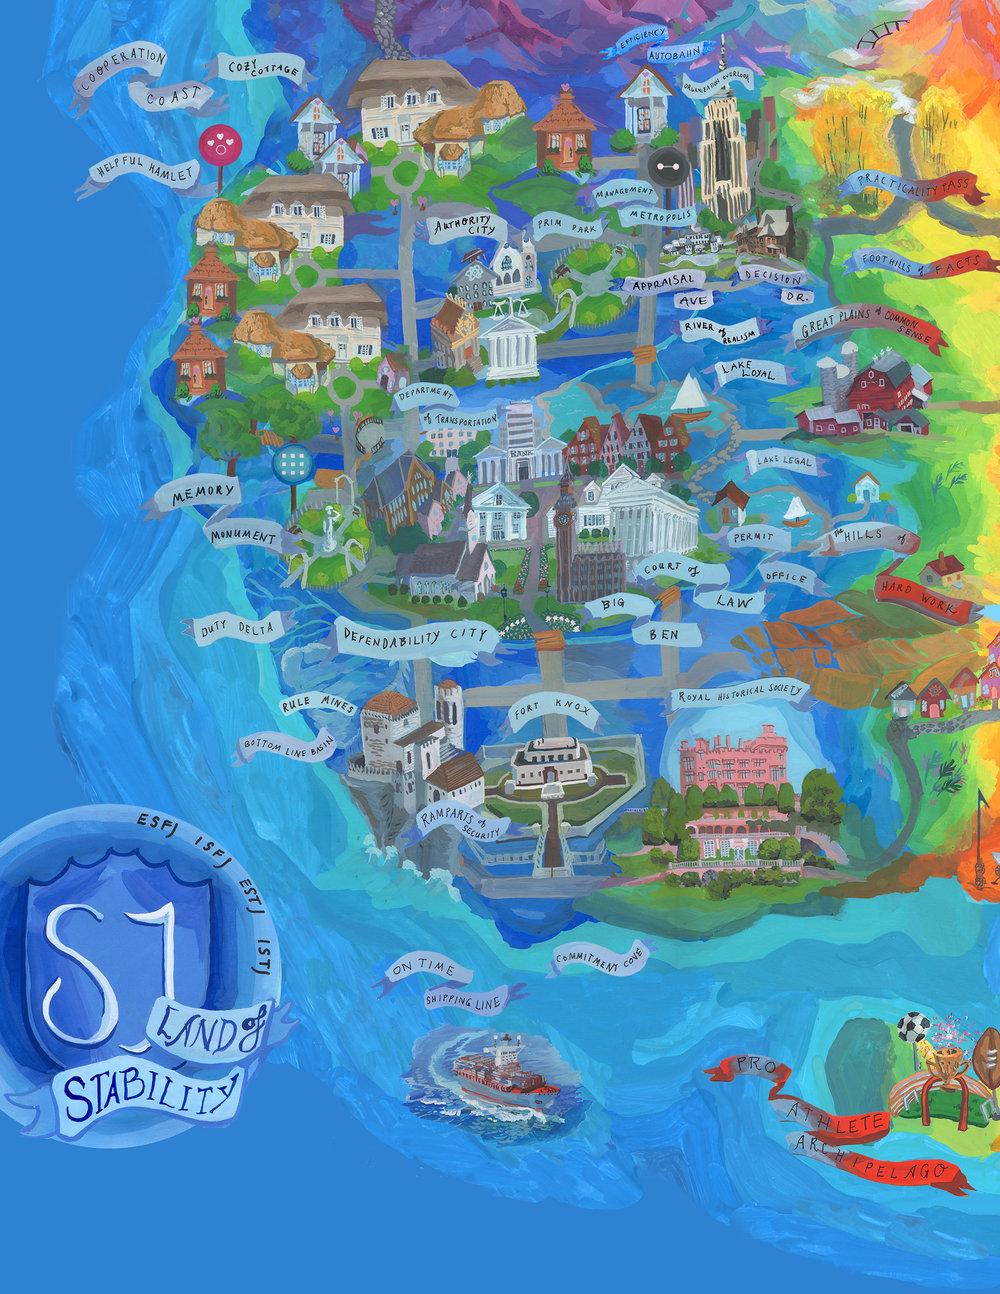 SJ Land.jpg